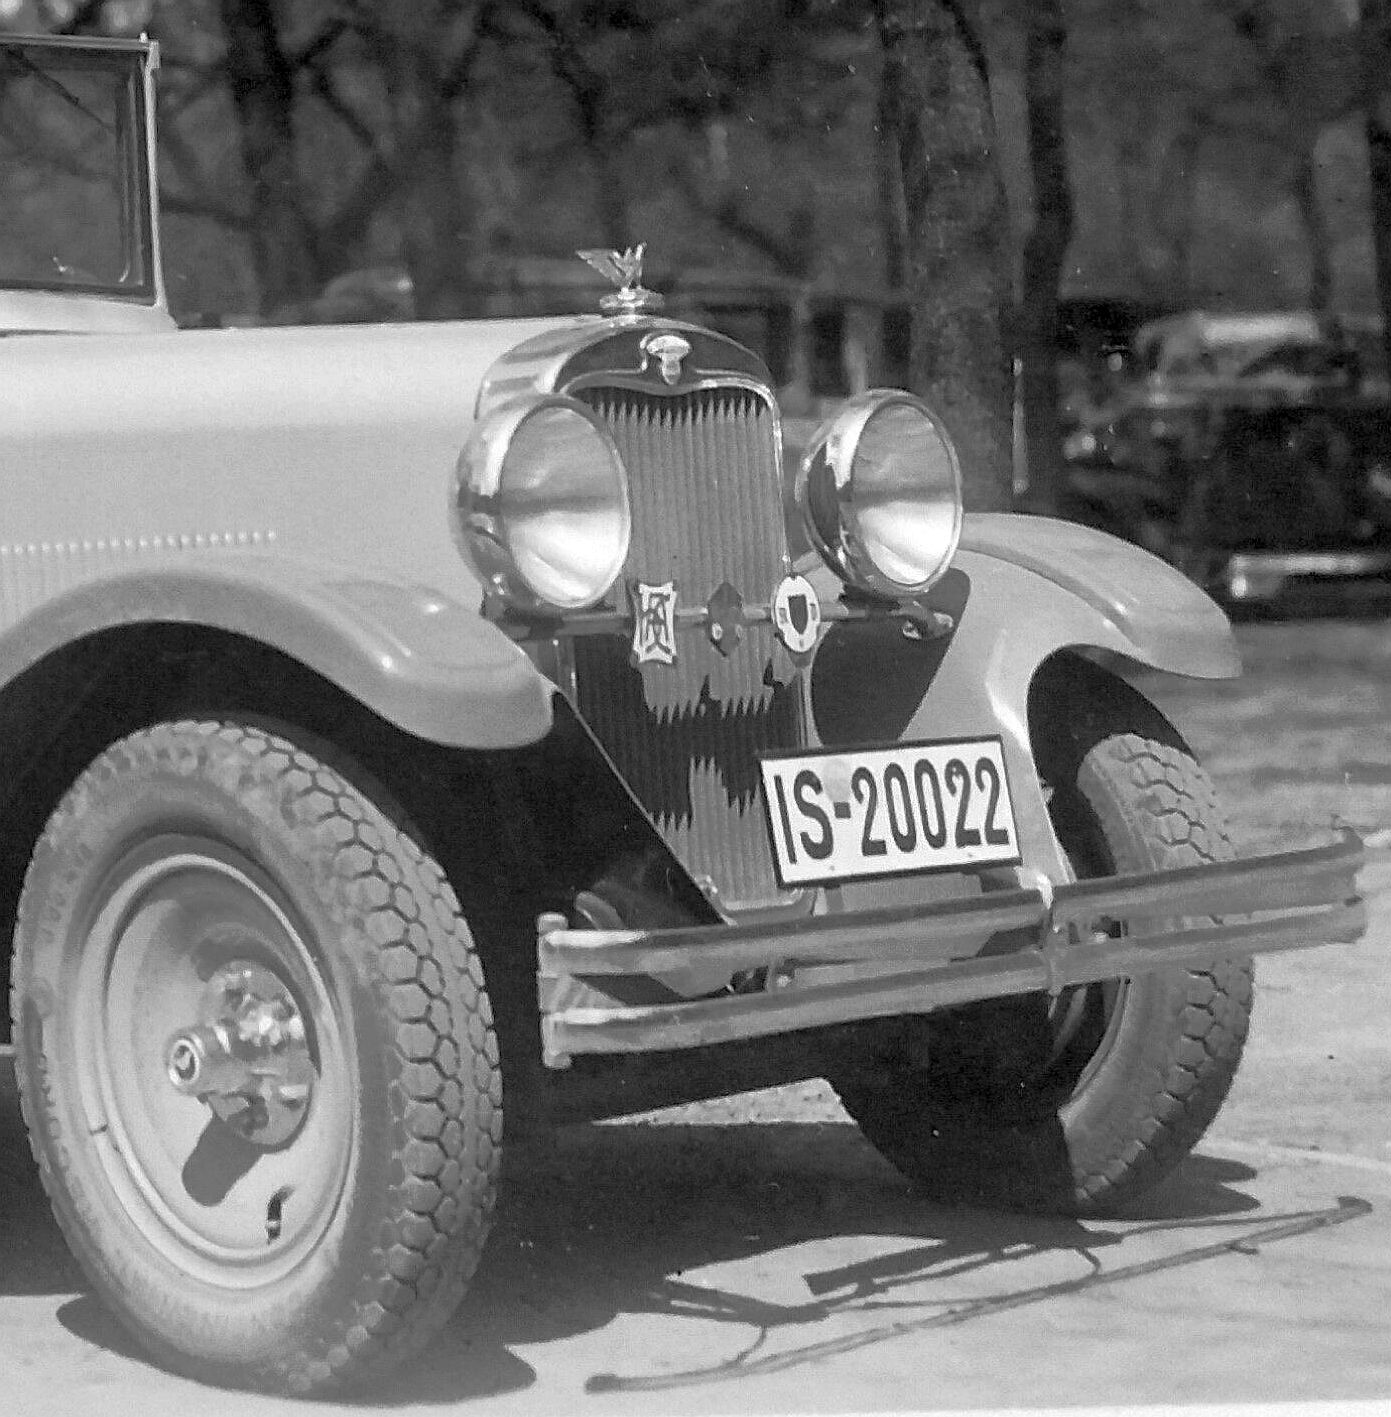 Wanderer_W11_1929-30_Harzburg_Pfingsten_1932_Sammlung_Bengsch_Frontpartie